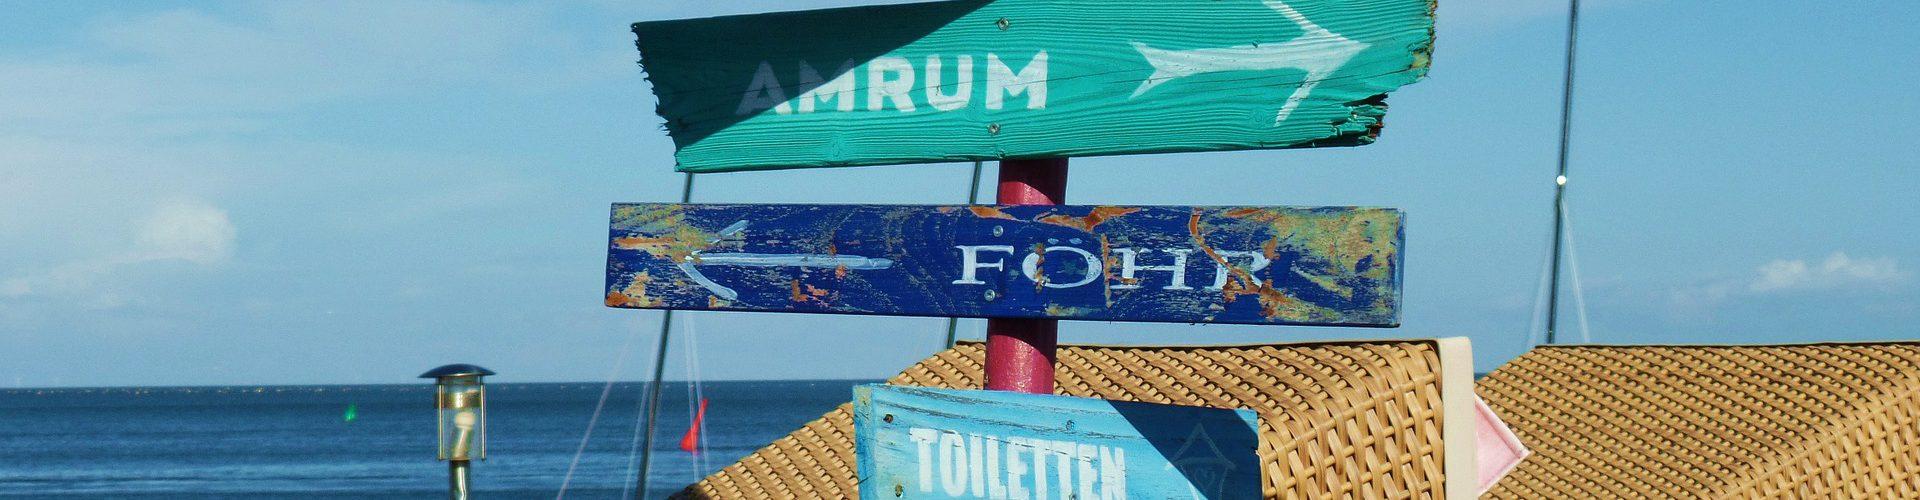 Strandwegweiser in Hörnum aus Sylt